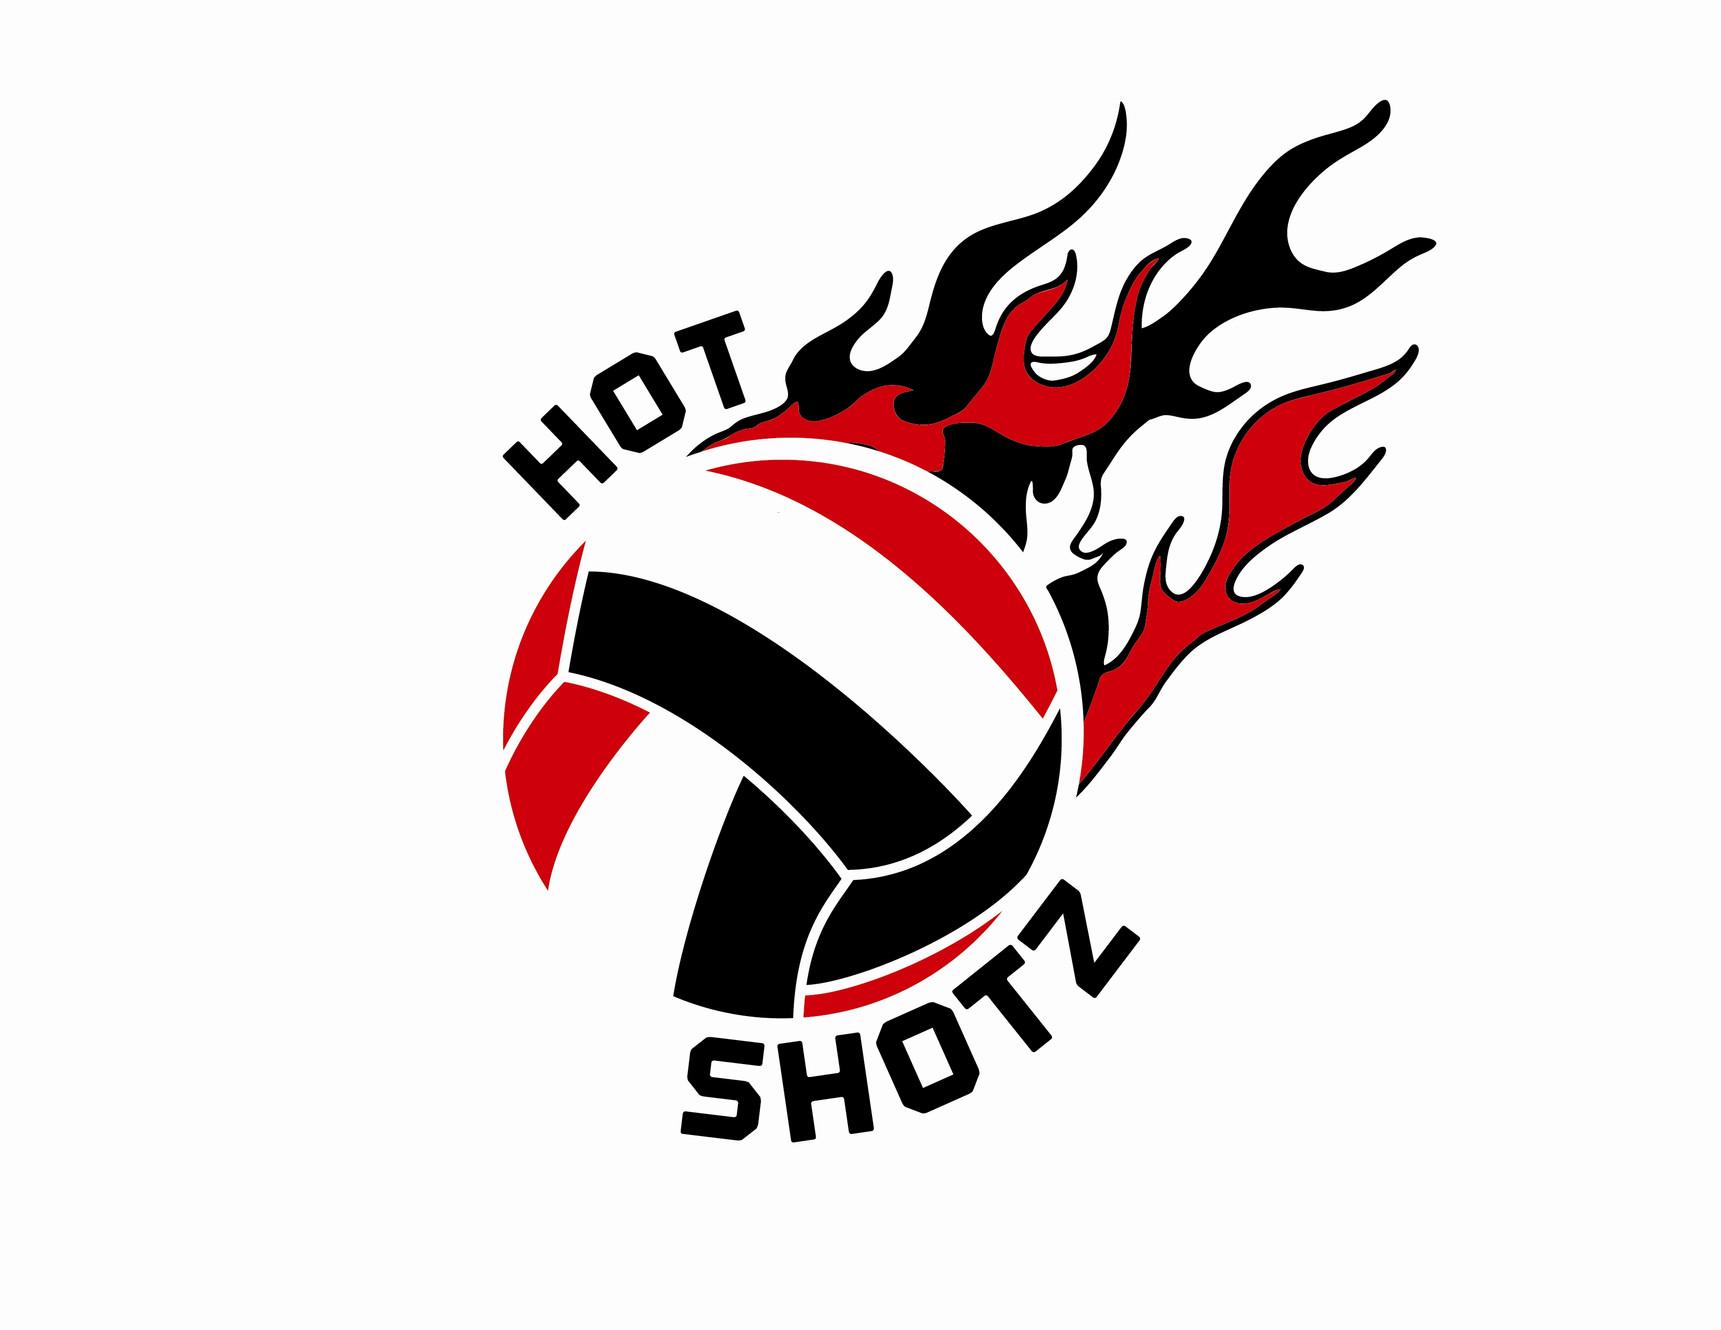 Hot Shotz Volleyball Club